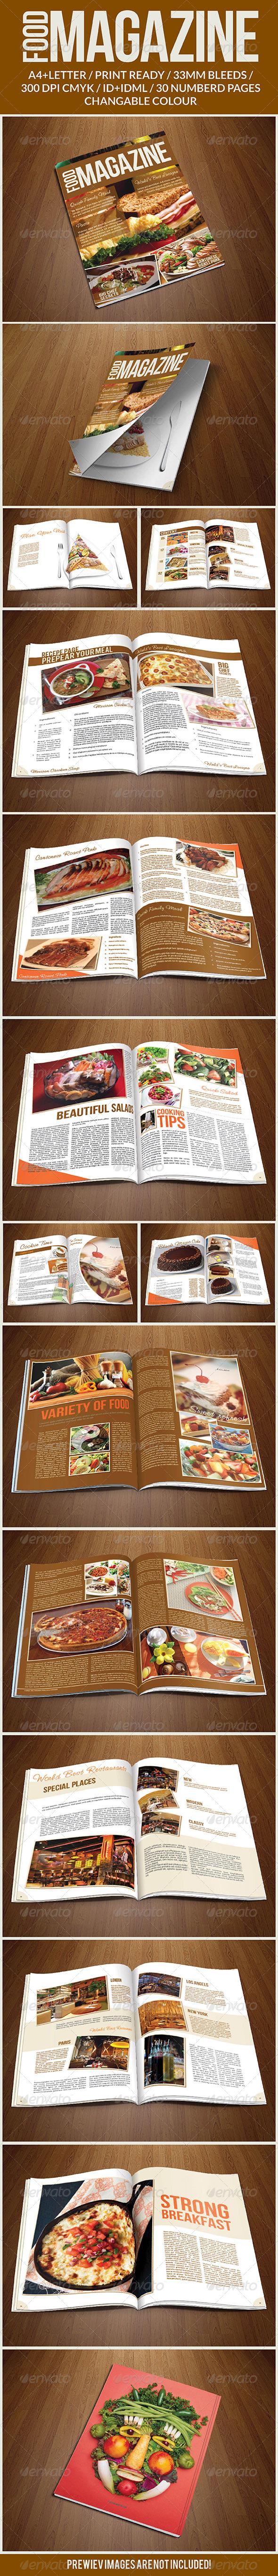 Food Magazine Template - Magazines Print Templates